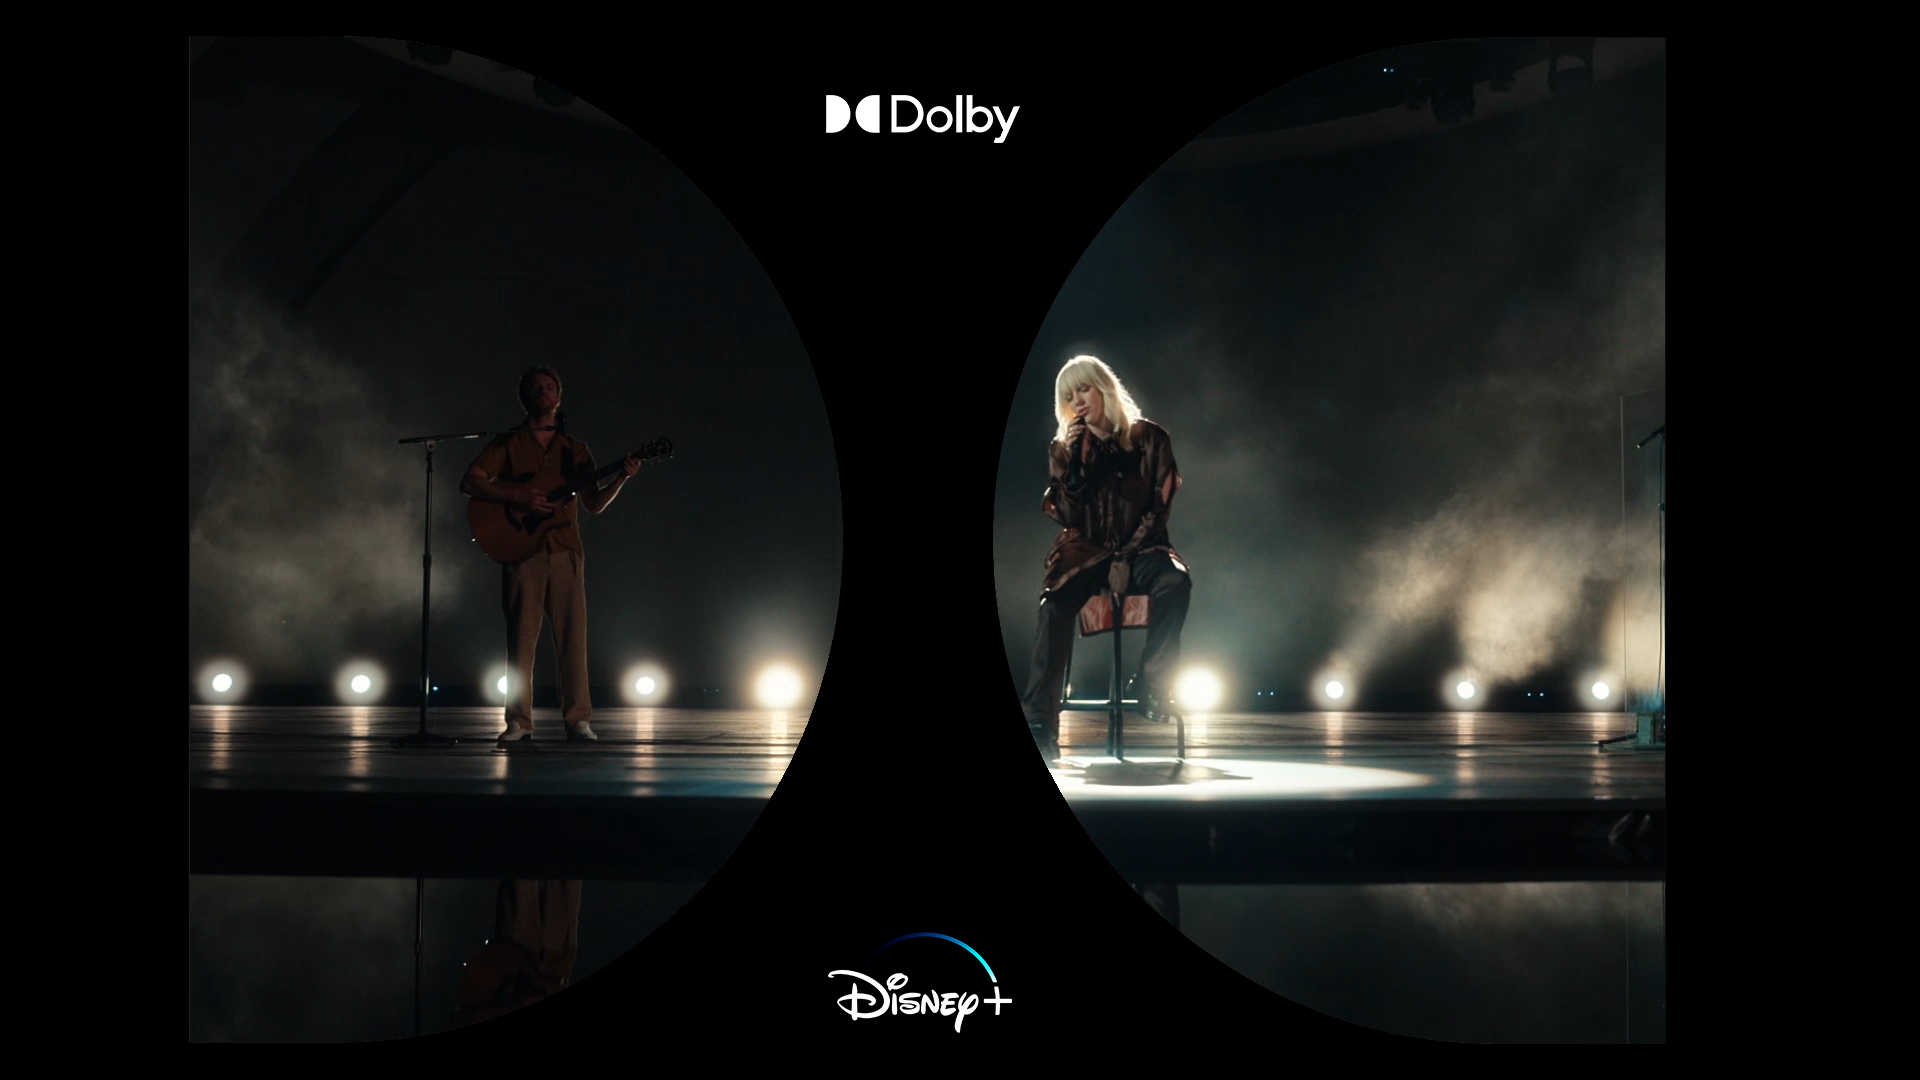 Dolby_Disney_Billie-Eilish_2.jpg